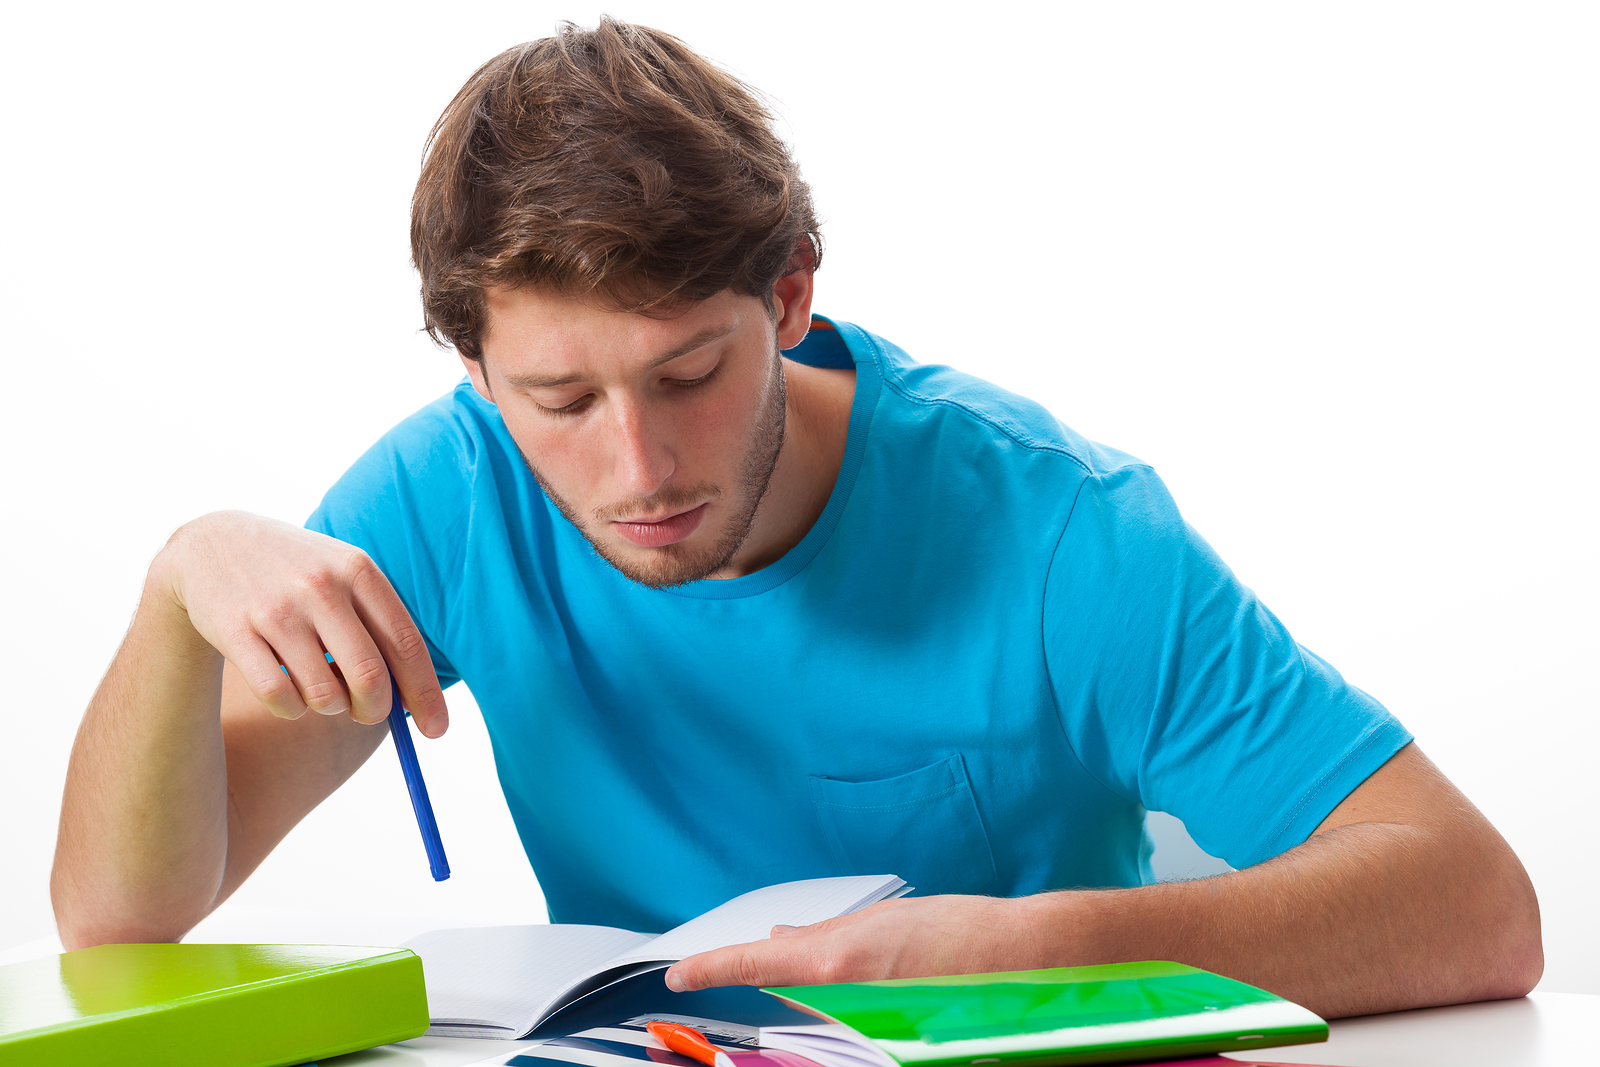 bigstock-Student-Working-On-Task-64007851.jpg